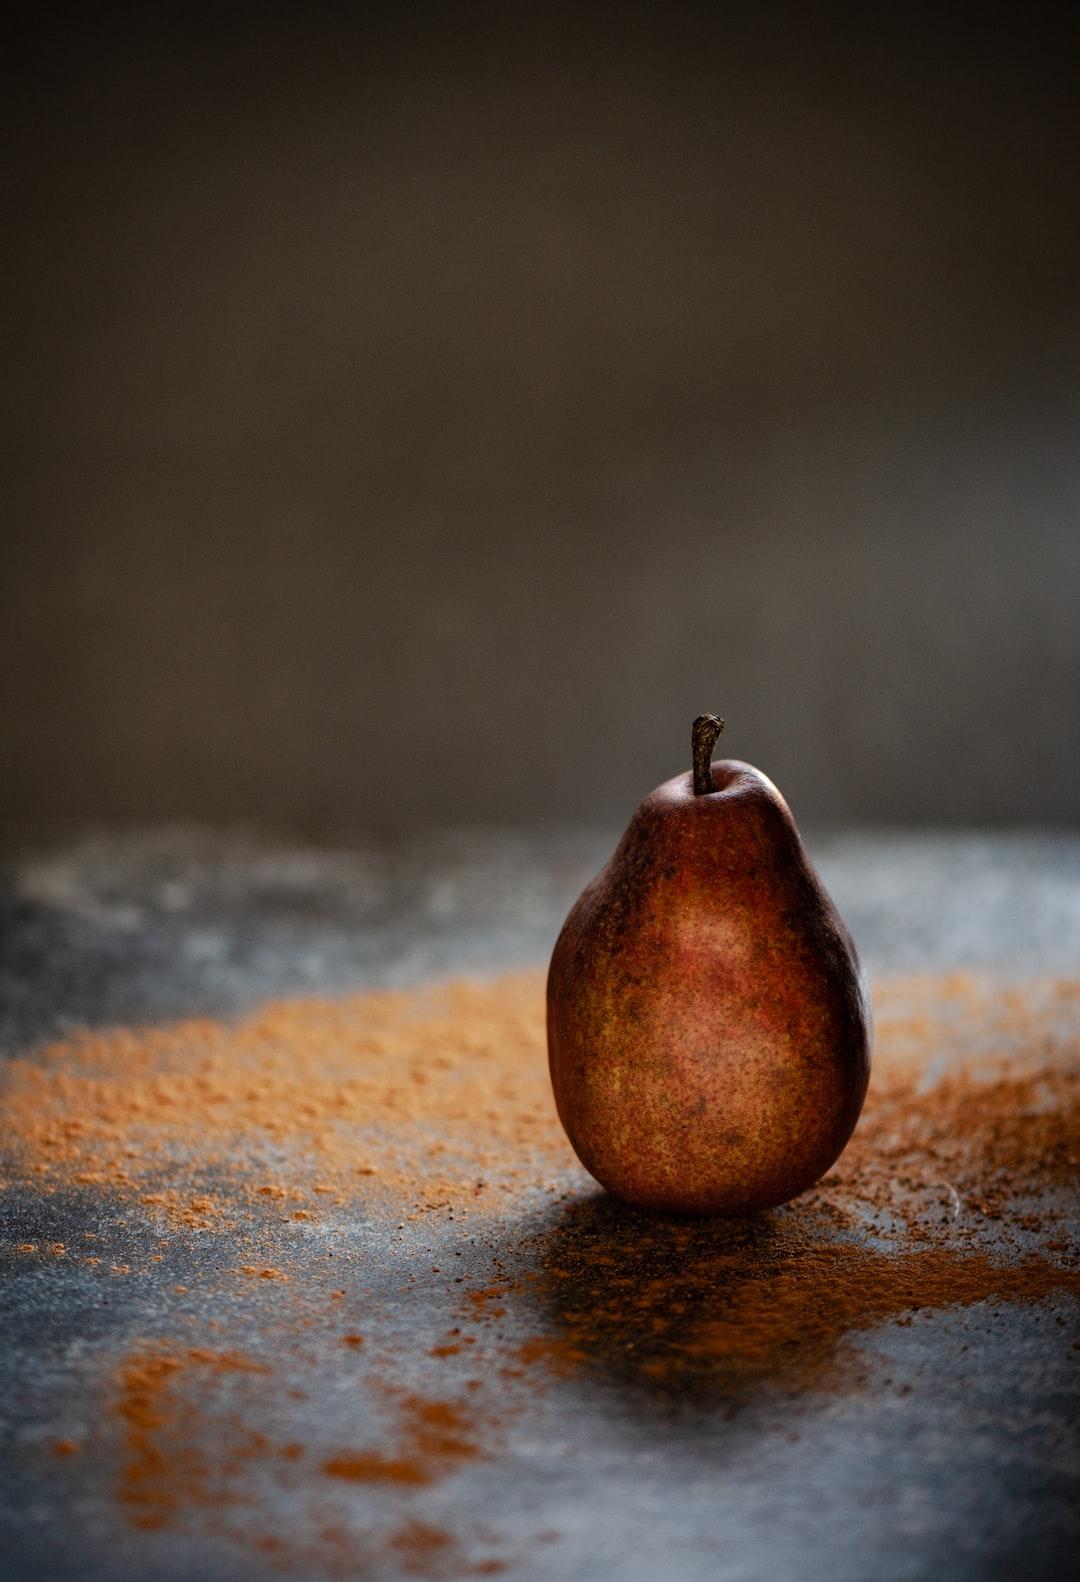 Pear, window light, cinnamon